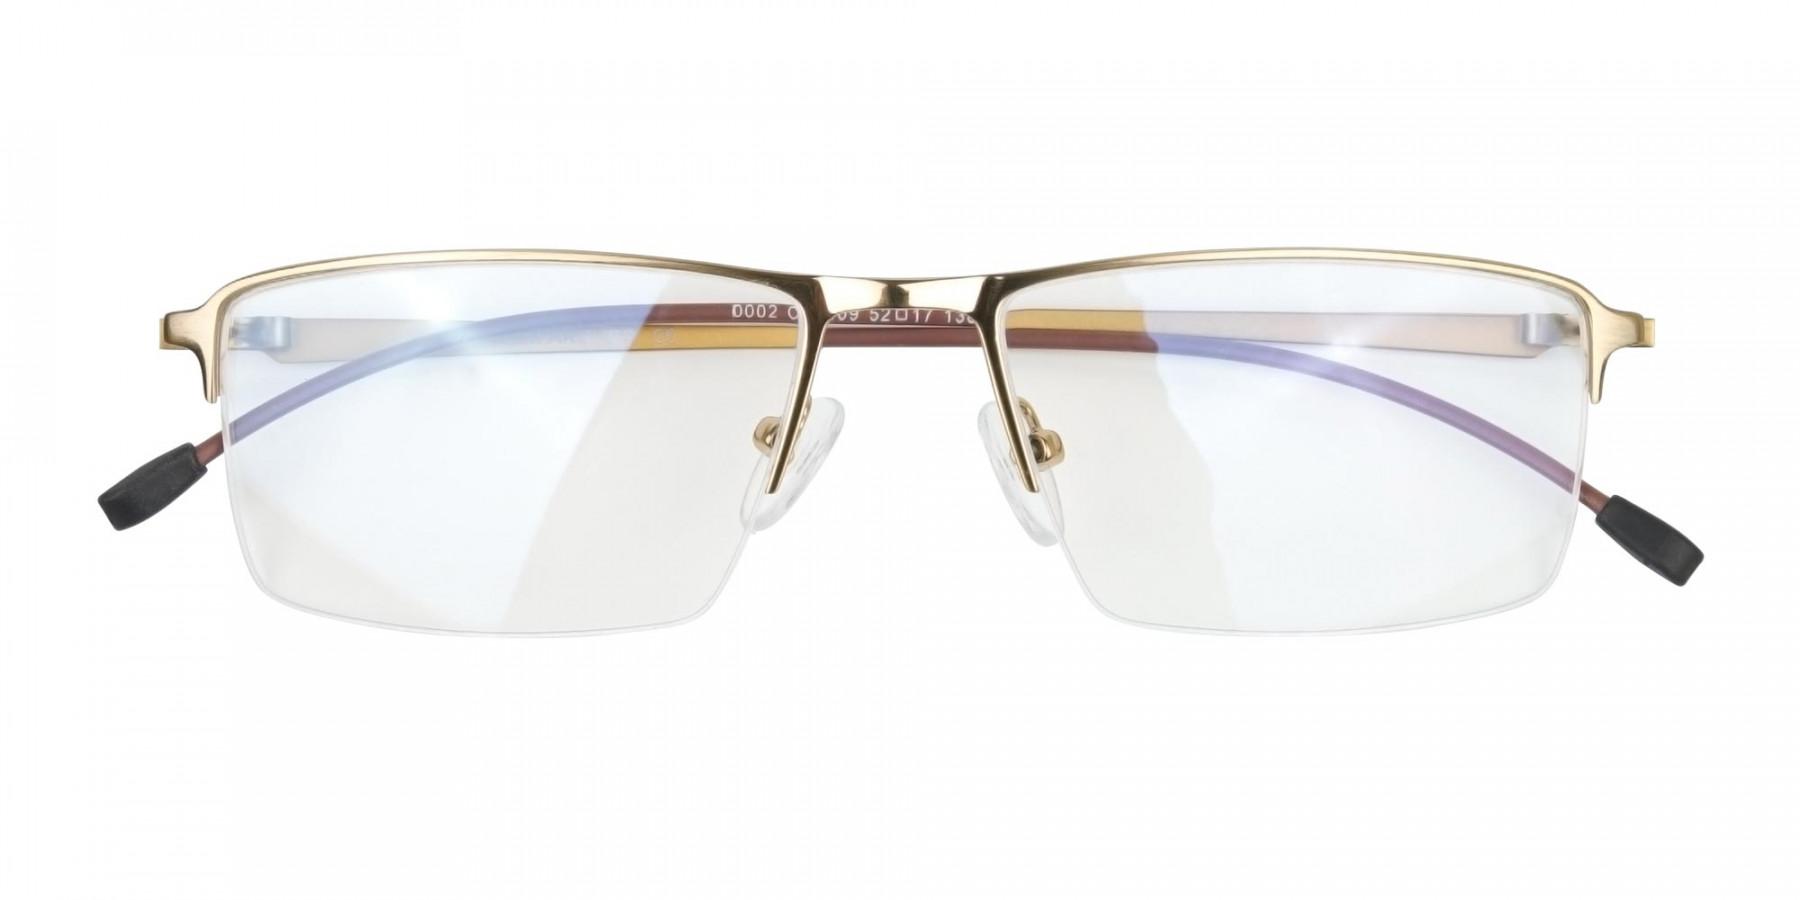 Gold Semi-Rim Glasses with Spring Hinges-1